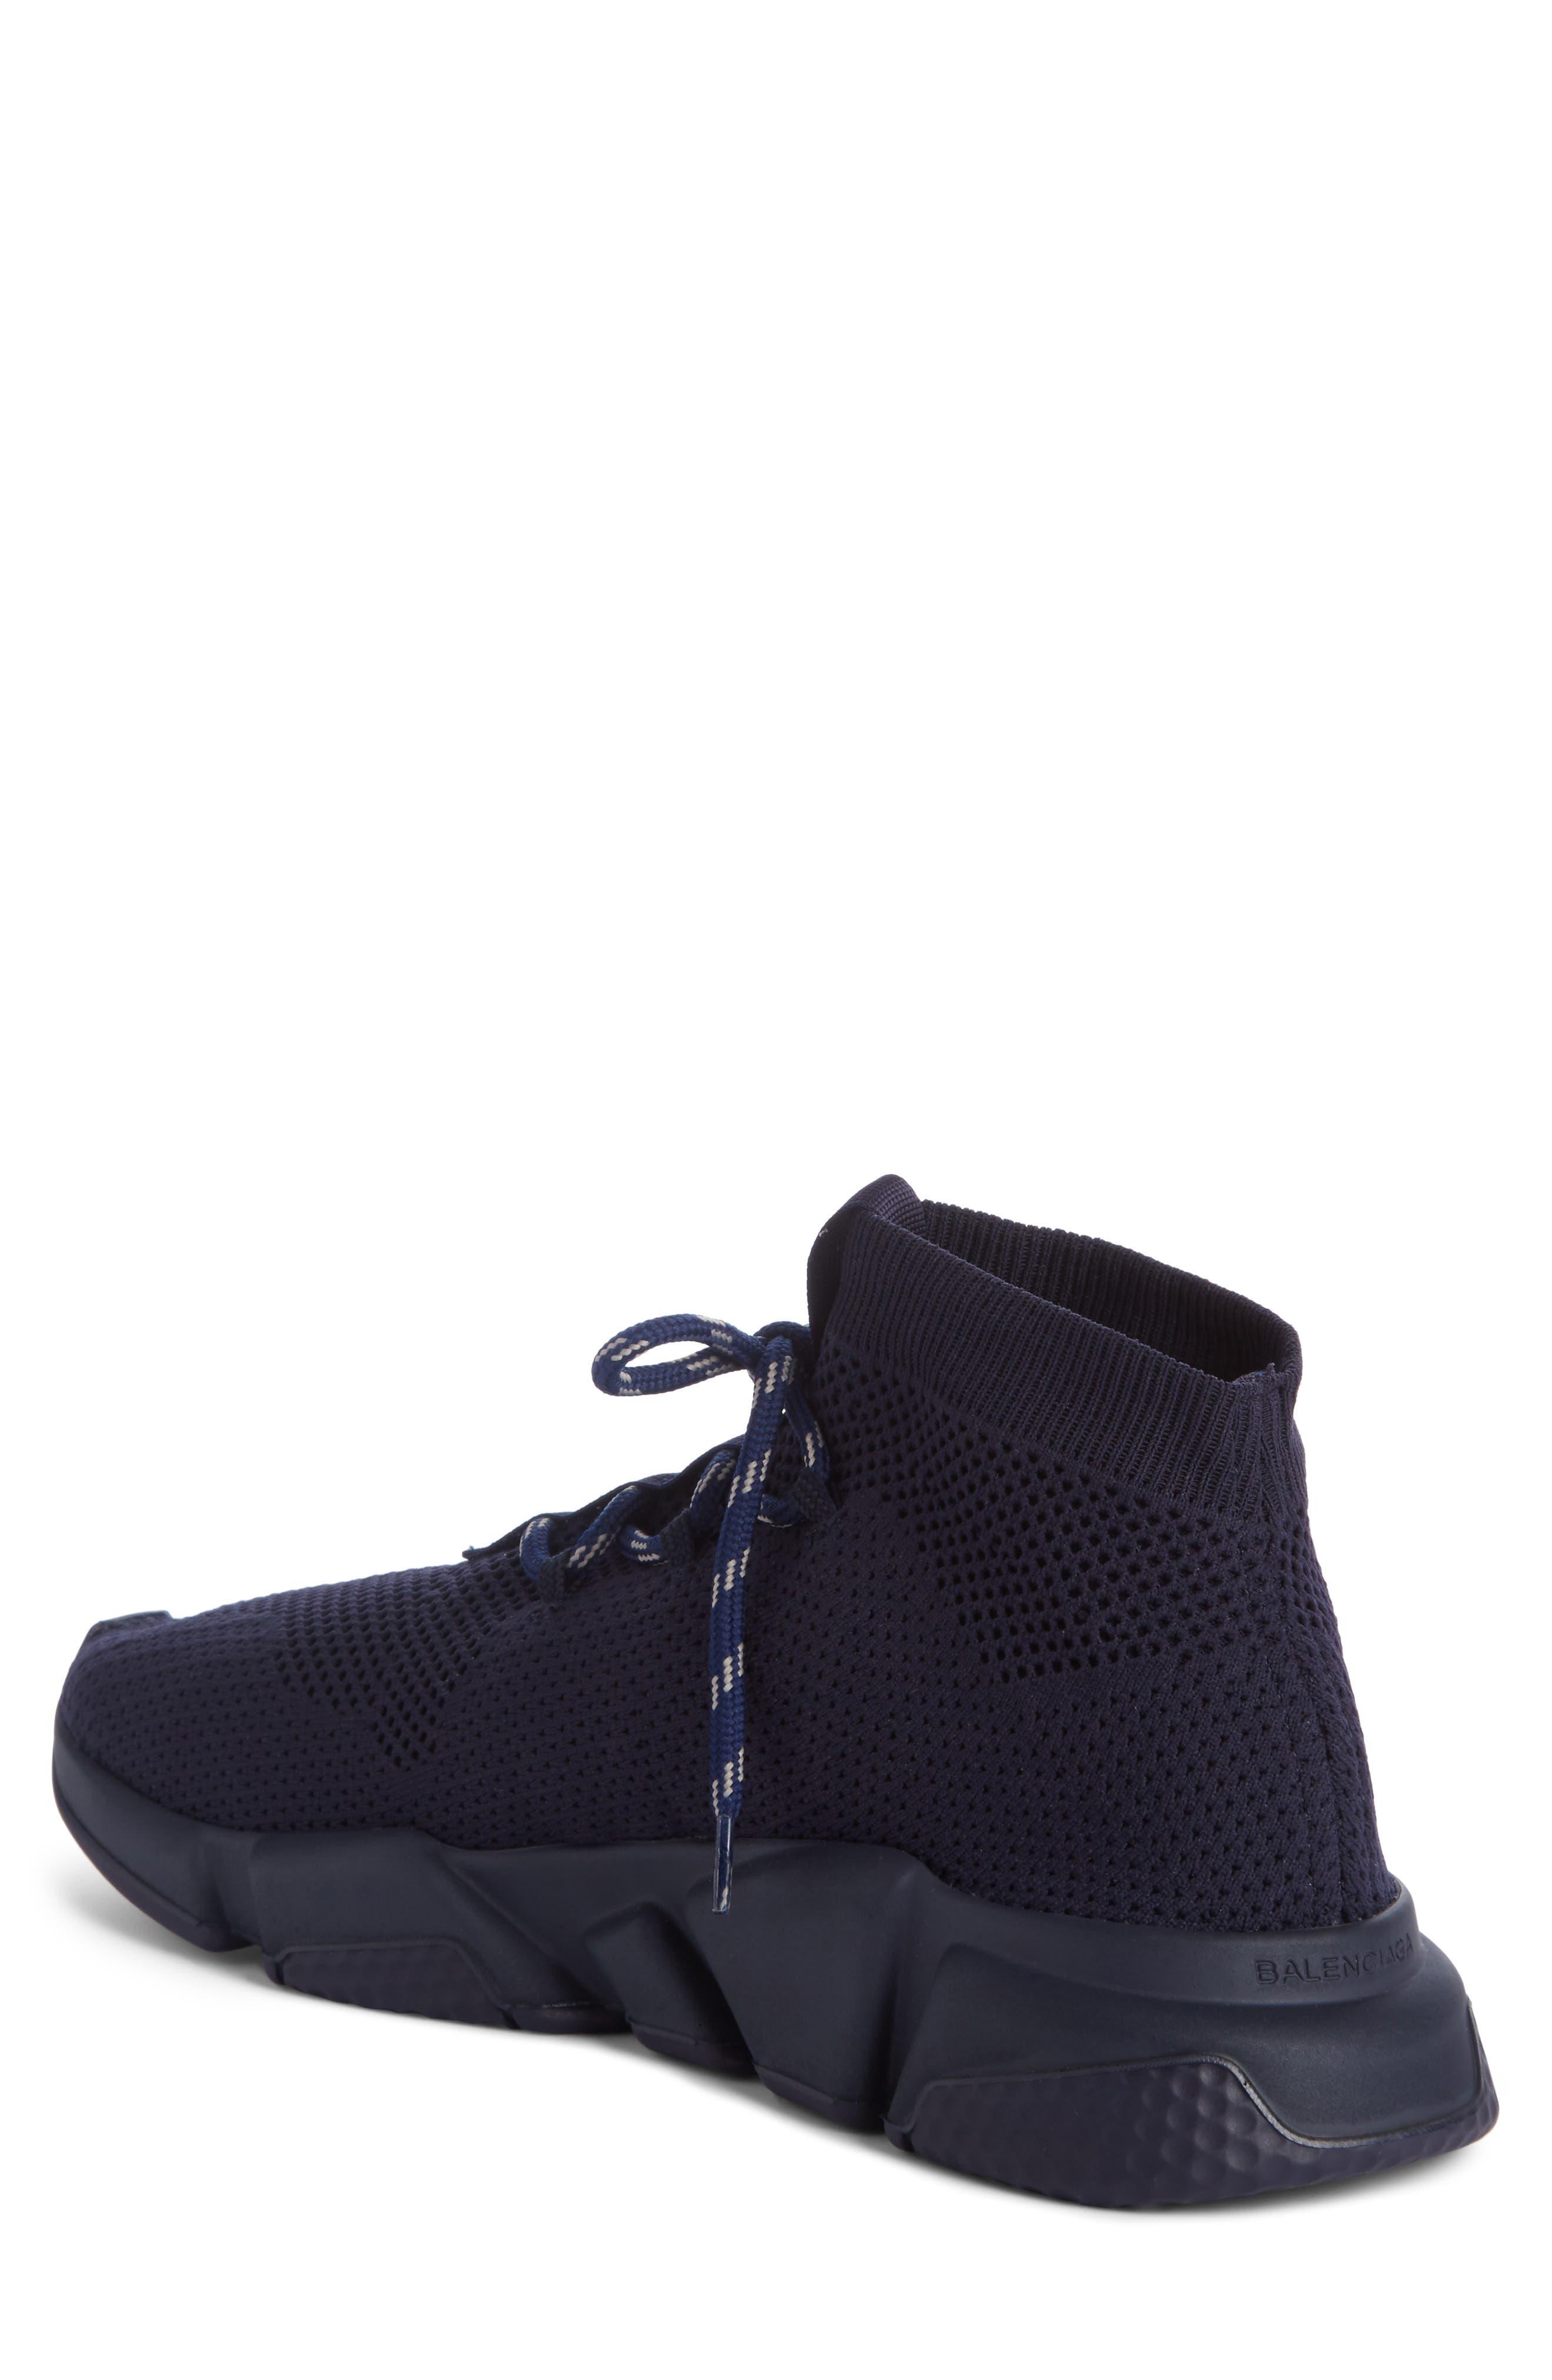 Mid-Top Sneaker,                             Alternate thumbnail 2, color,                             Blue Marine/Blanc White